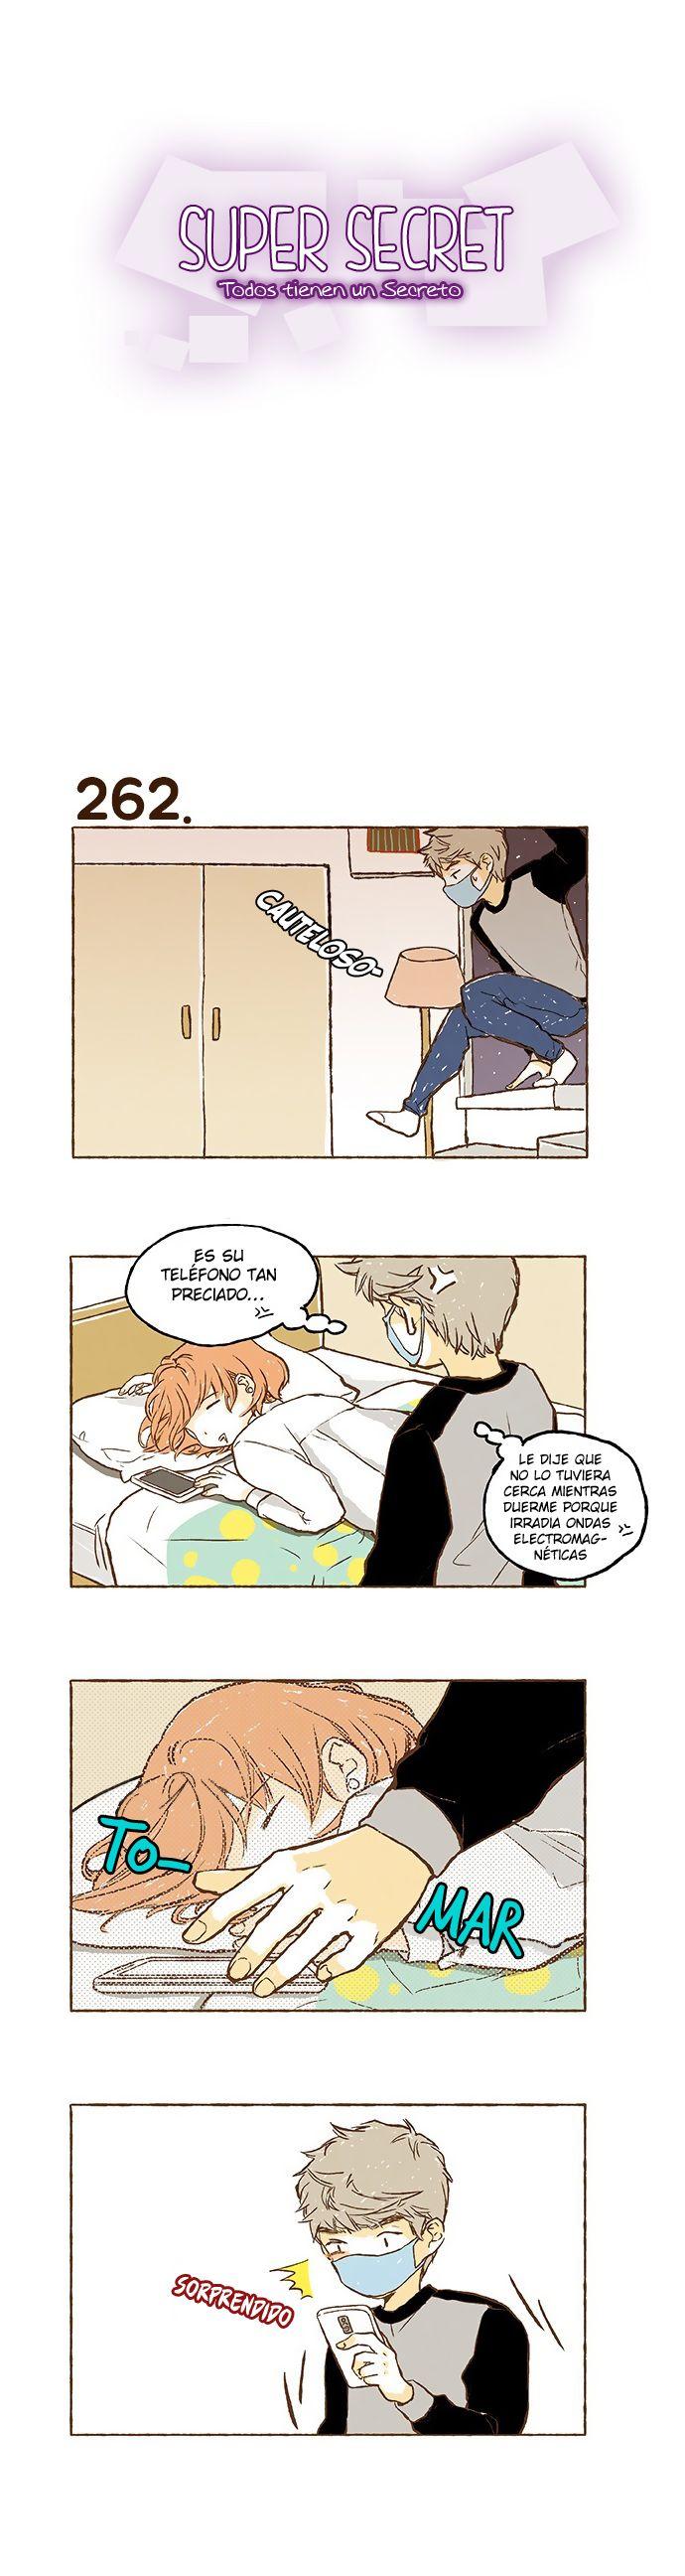 http://c5.ninemanga.com/es_manga/pic2/61/17725/527882/e894d787e2fd6c133af47140aa156f00.jpg Page 2